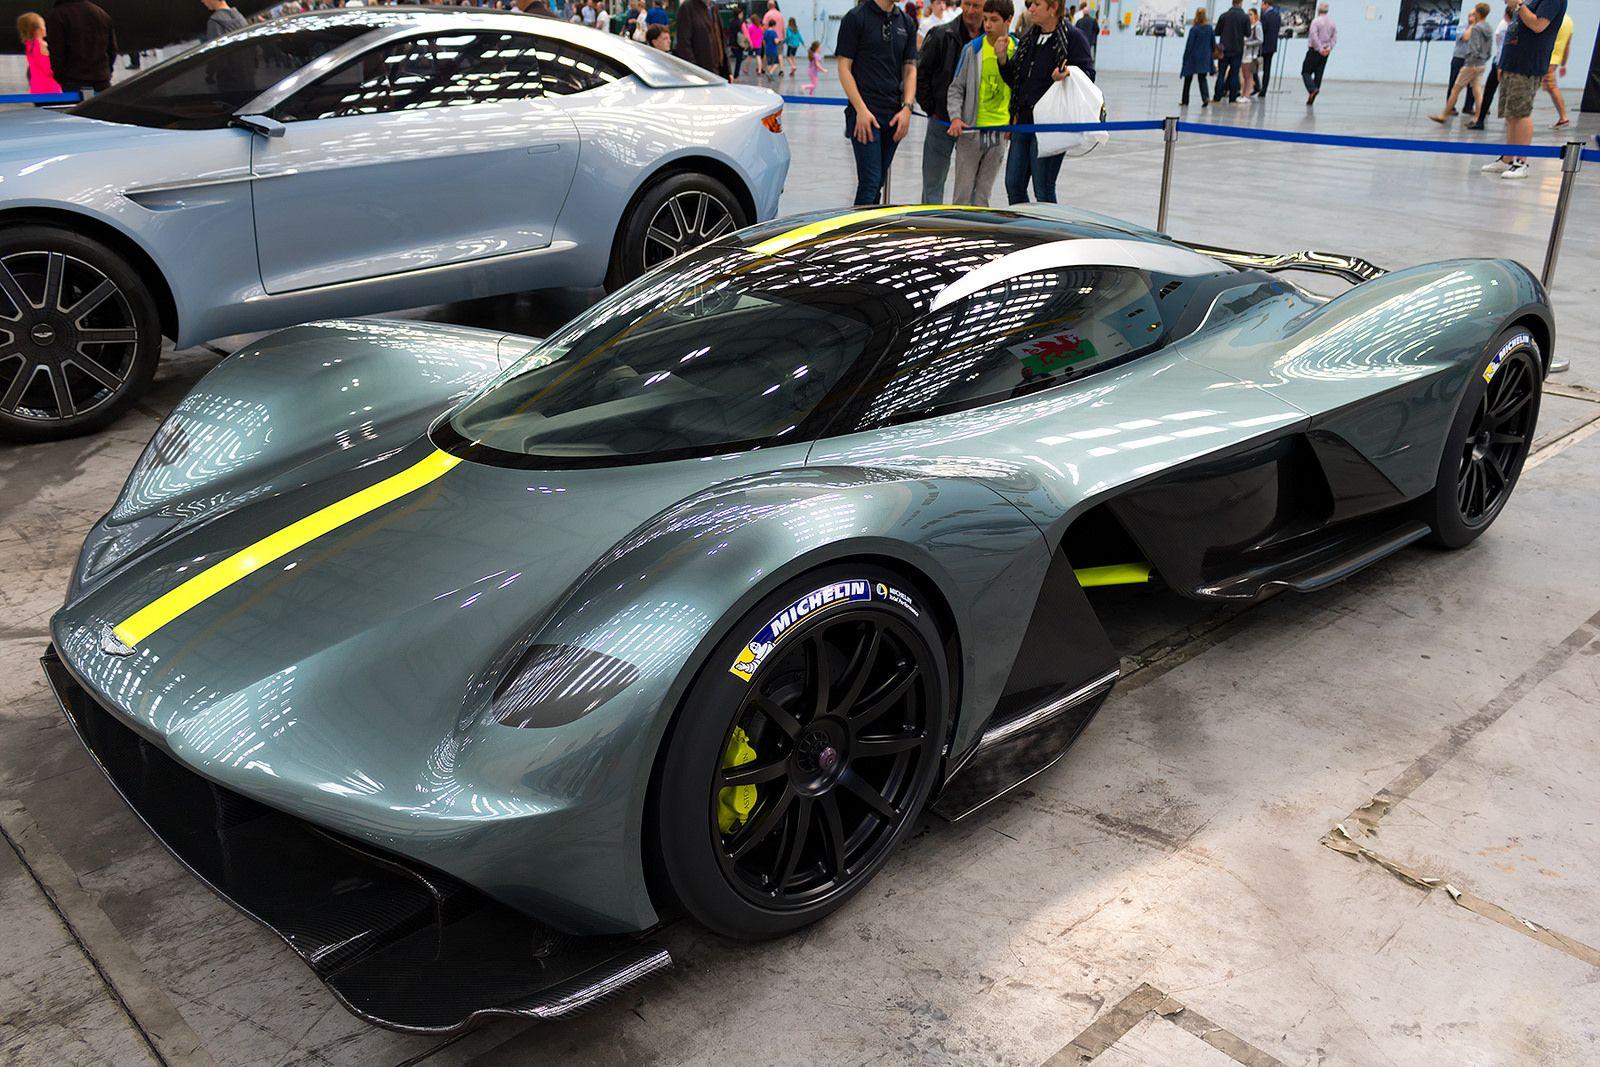 Aston martin valkyrie 1 000kg 1 000hp car photos pinterest aston martin automotive design and car photos